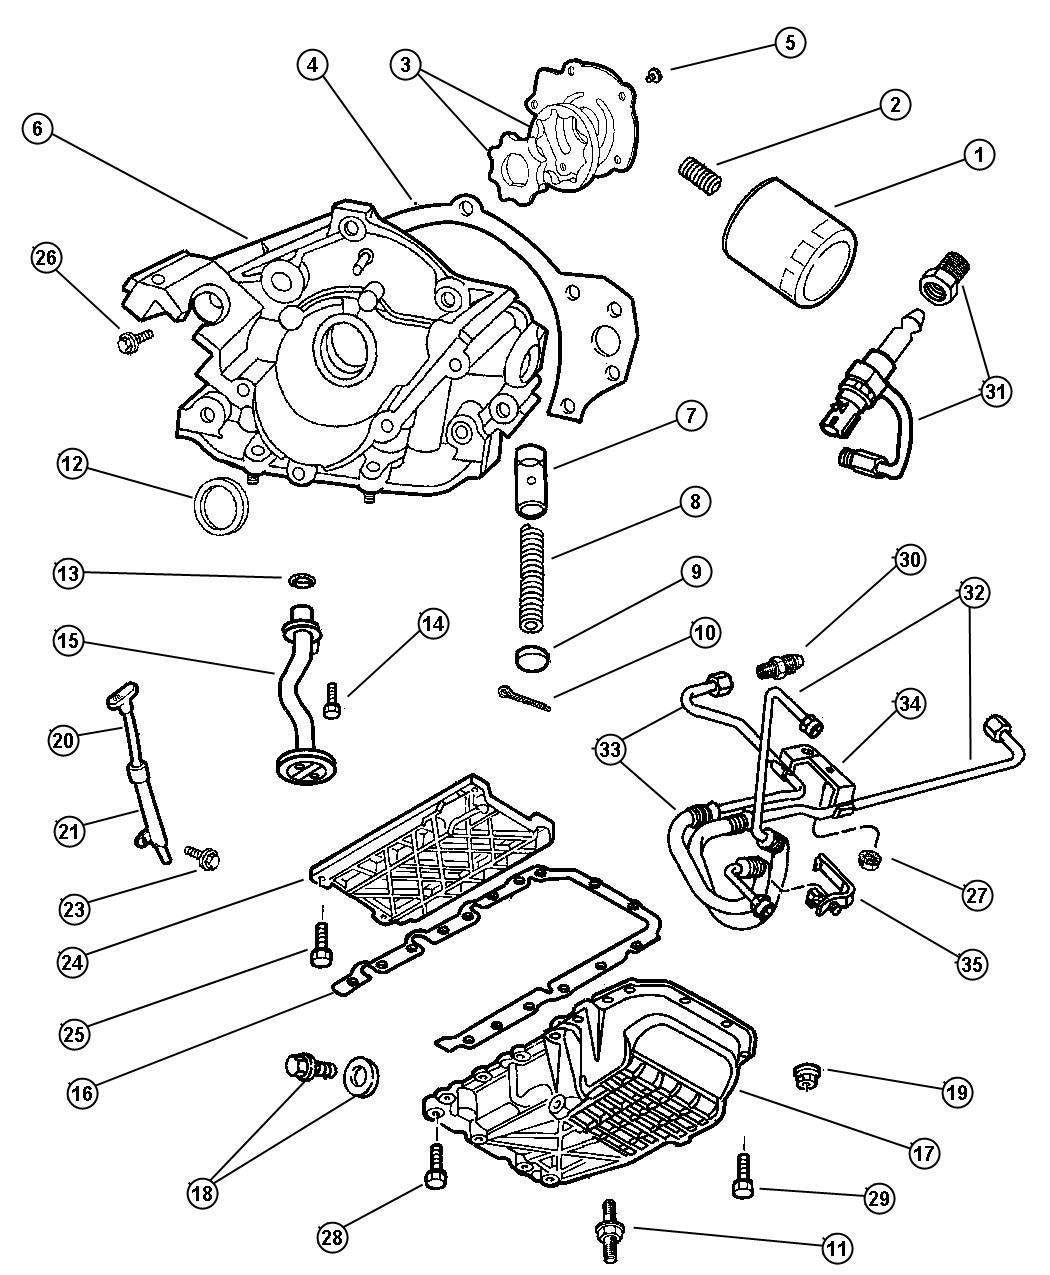 Dodge Ram 2500 Spring  Oil Pressure Relief Valve  Oil Pump